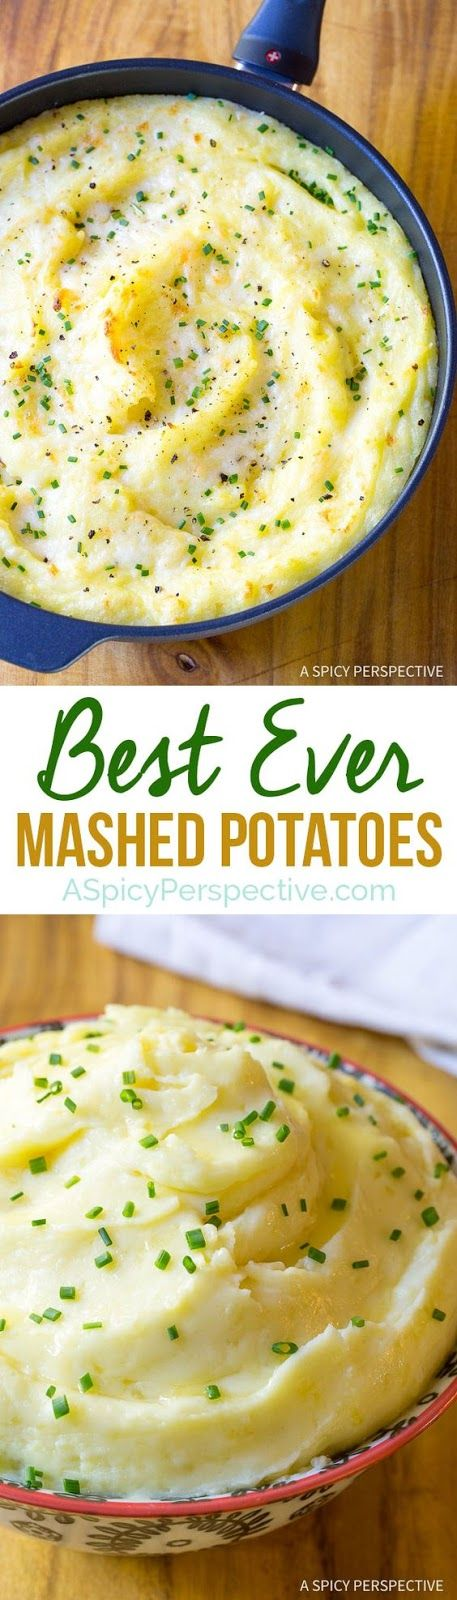 Best Mashed Potatoes Recipe: